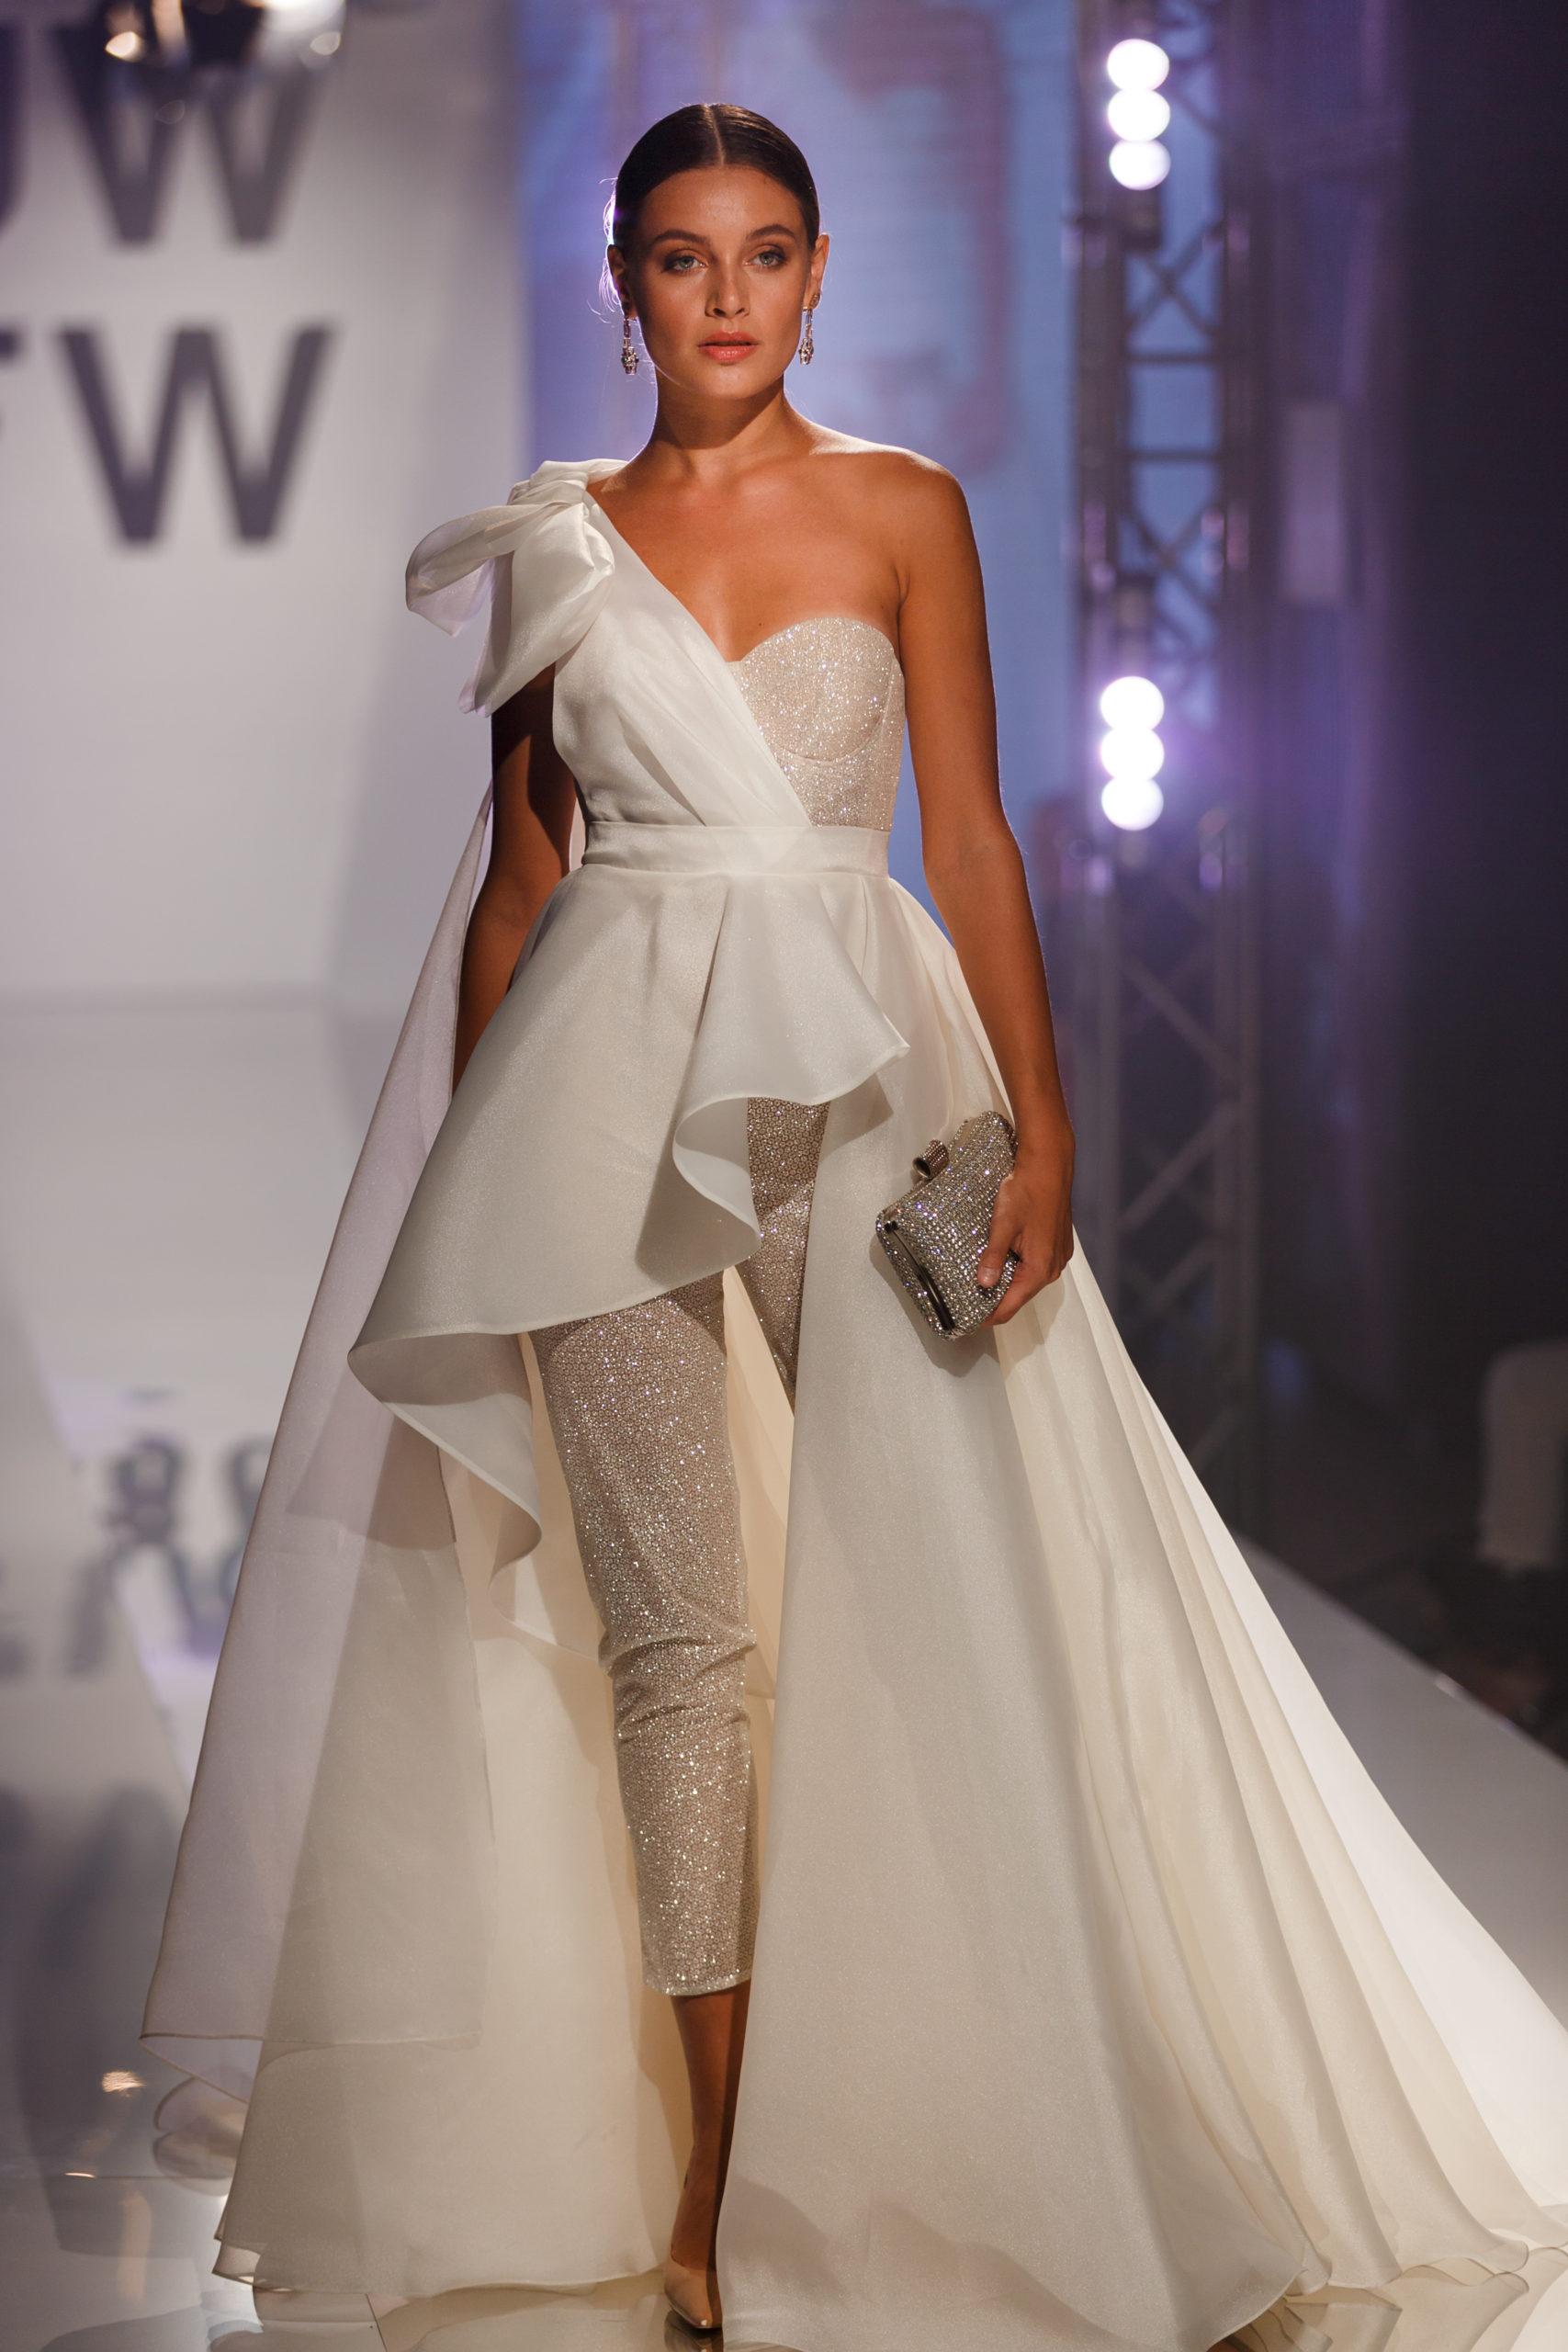 combinaison jumpsuit mariage civil glitter mariage geneve pantalon amovible noeud drapé satin organza geneve mariage suisse